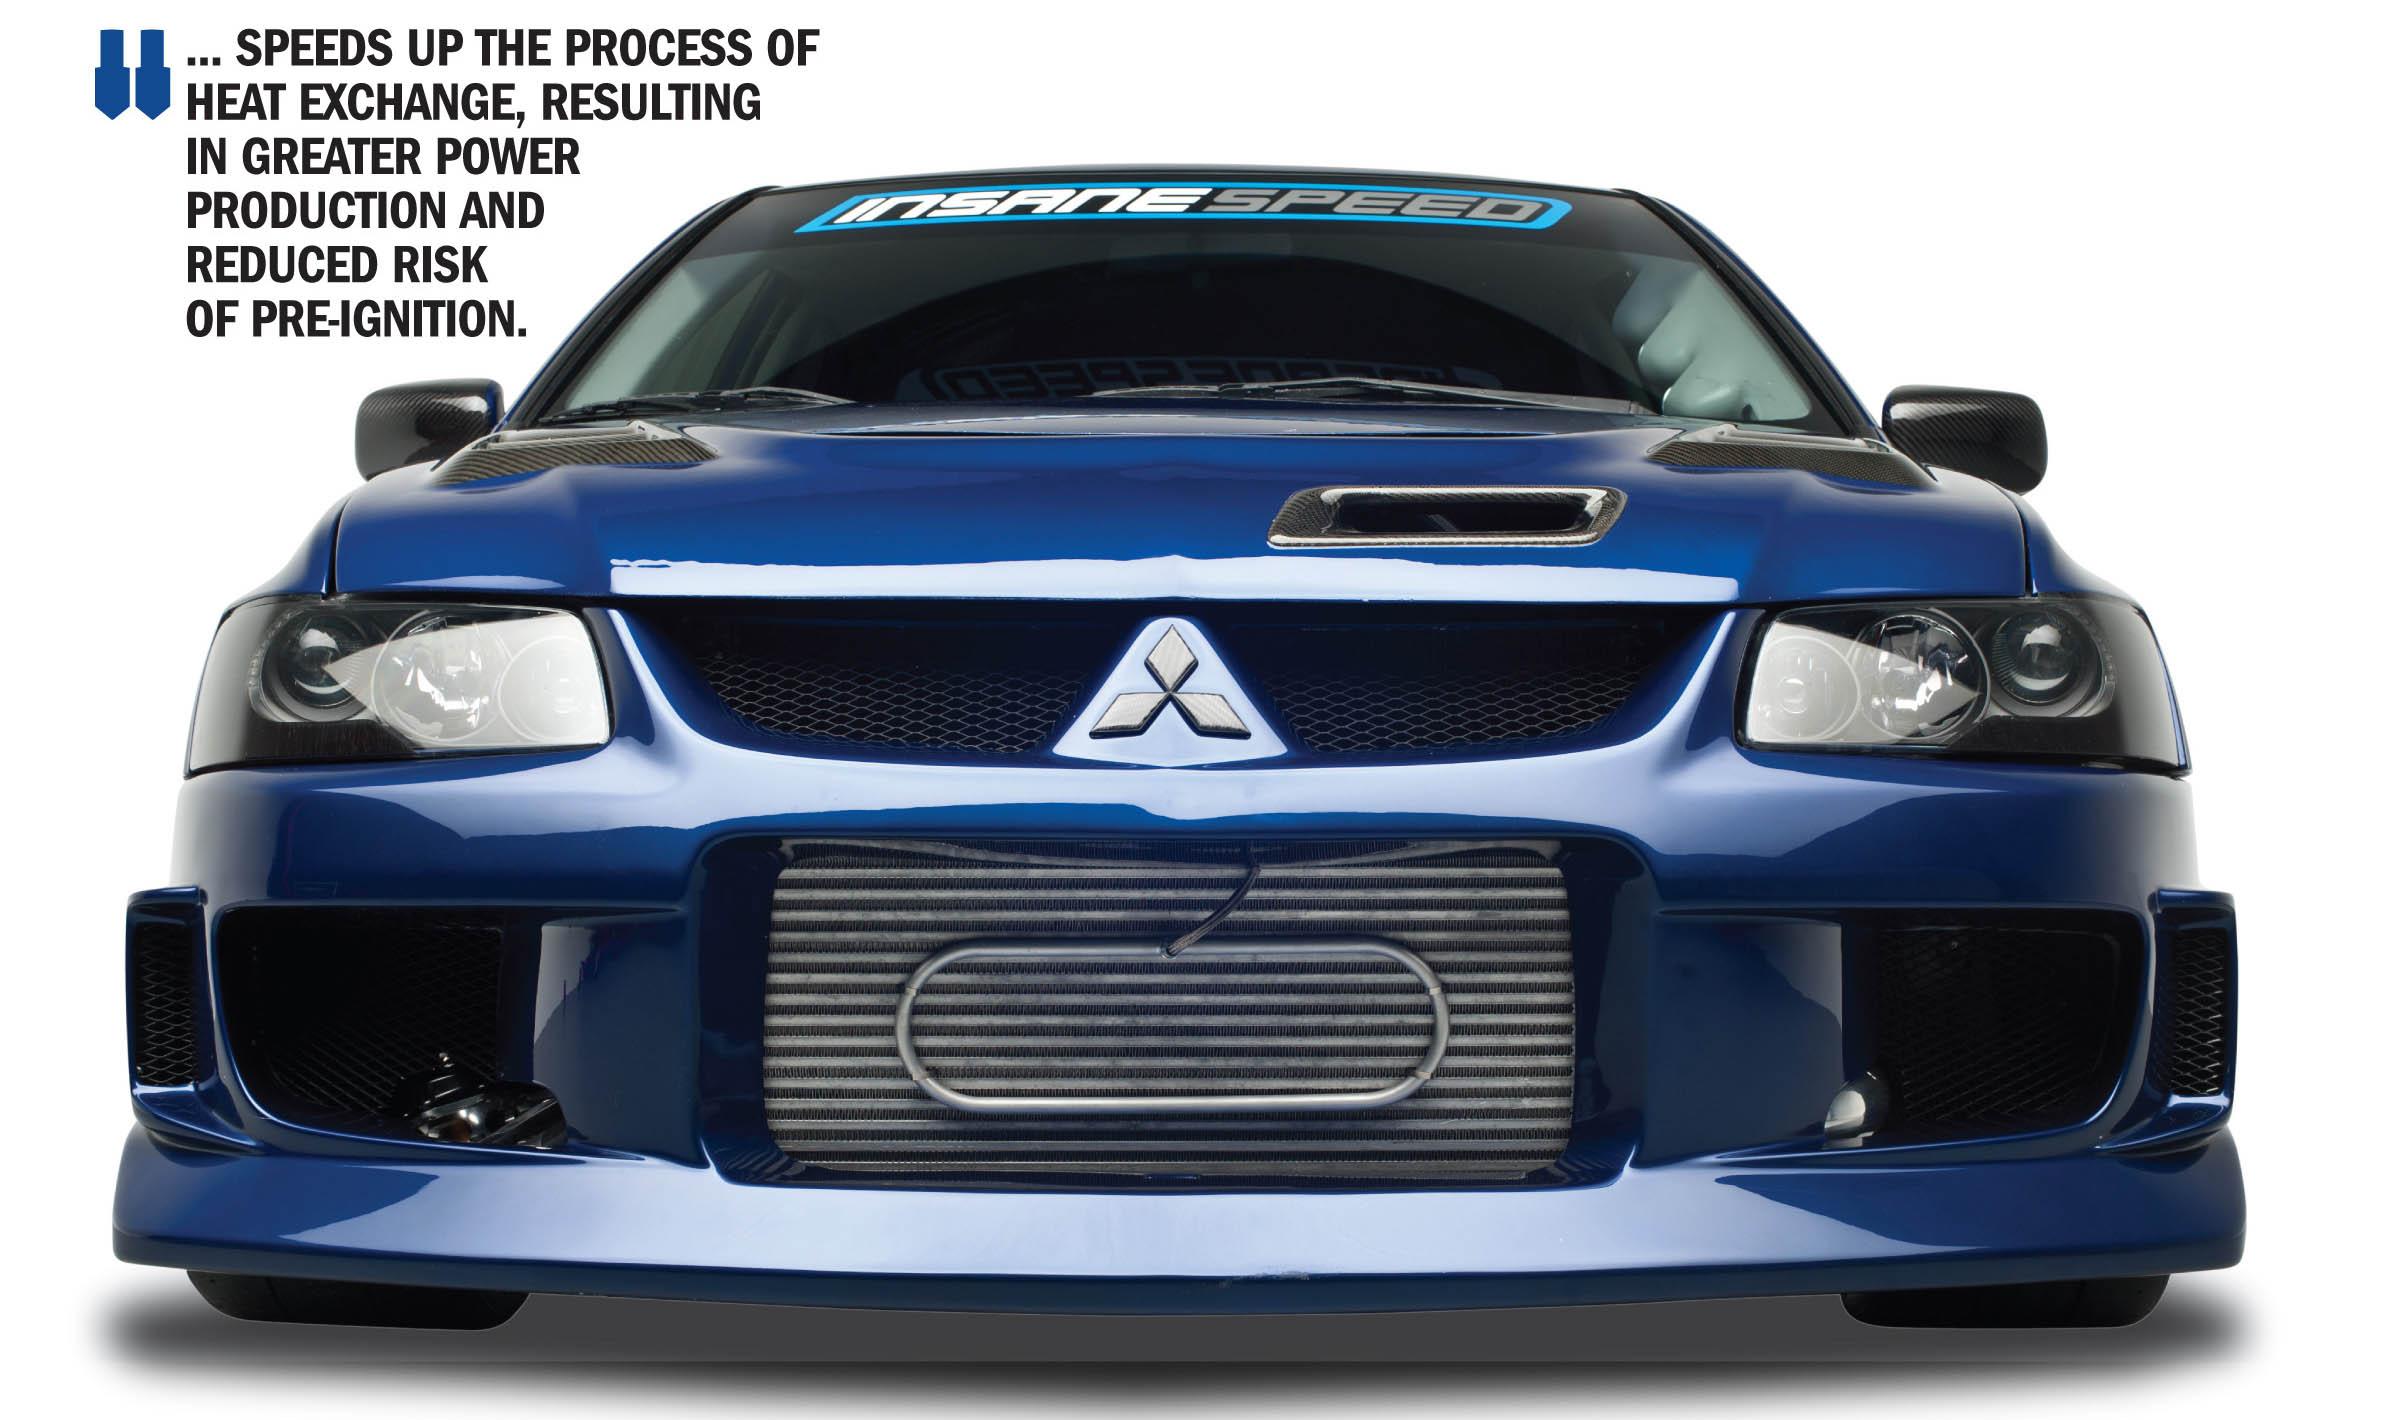 103_068-077_FC_Blue EVO8_0XX DRAG Sport_qx